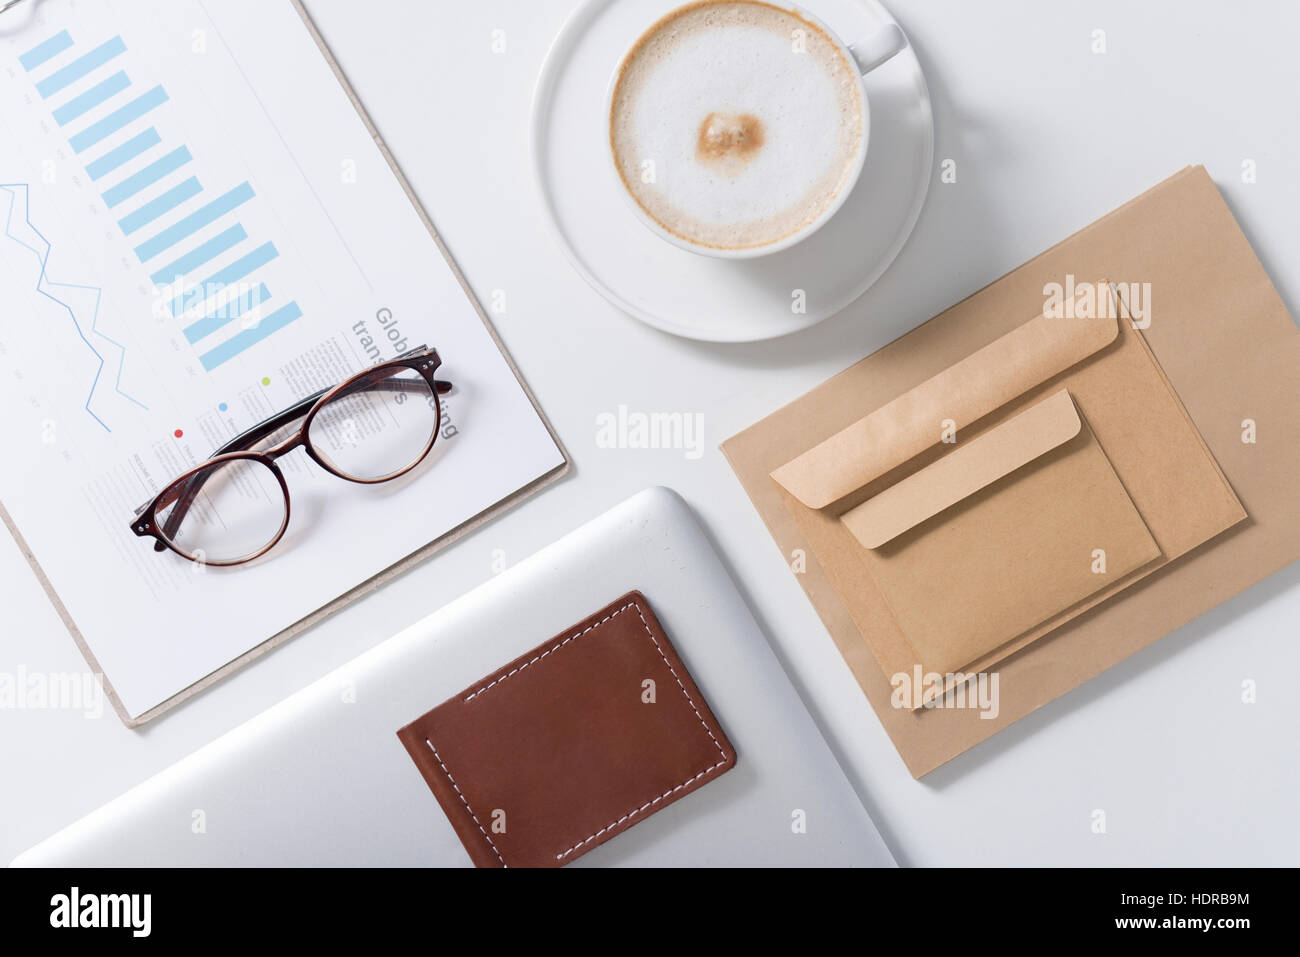 Eyeglasses lying on statistical data documents - Stock Image